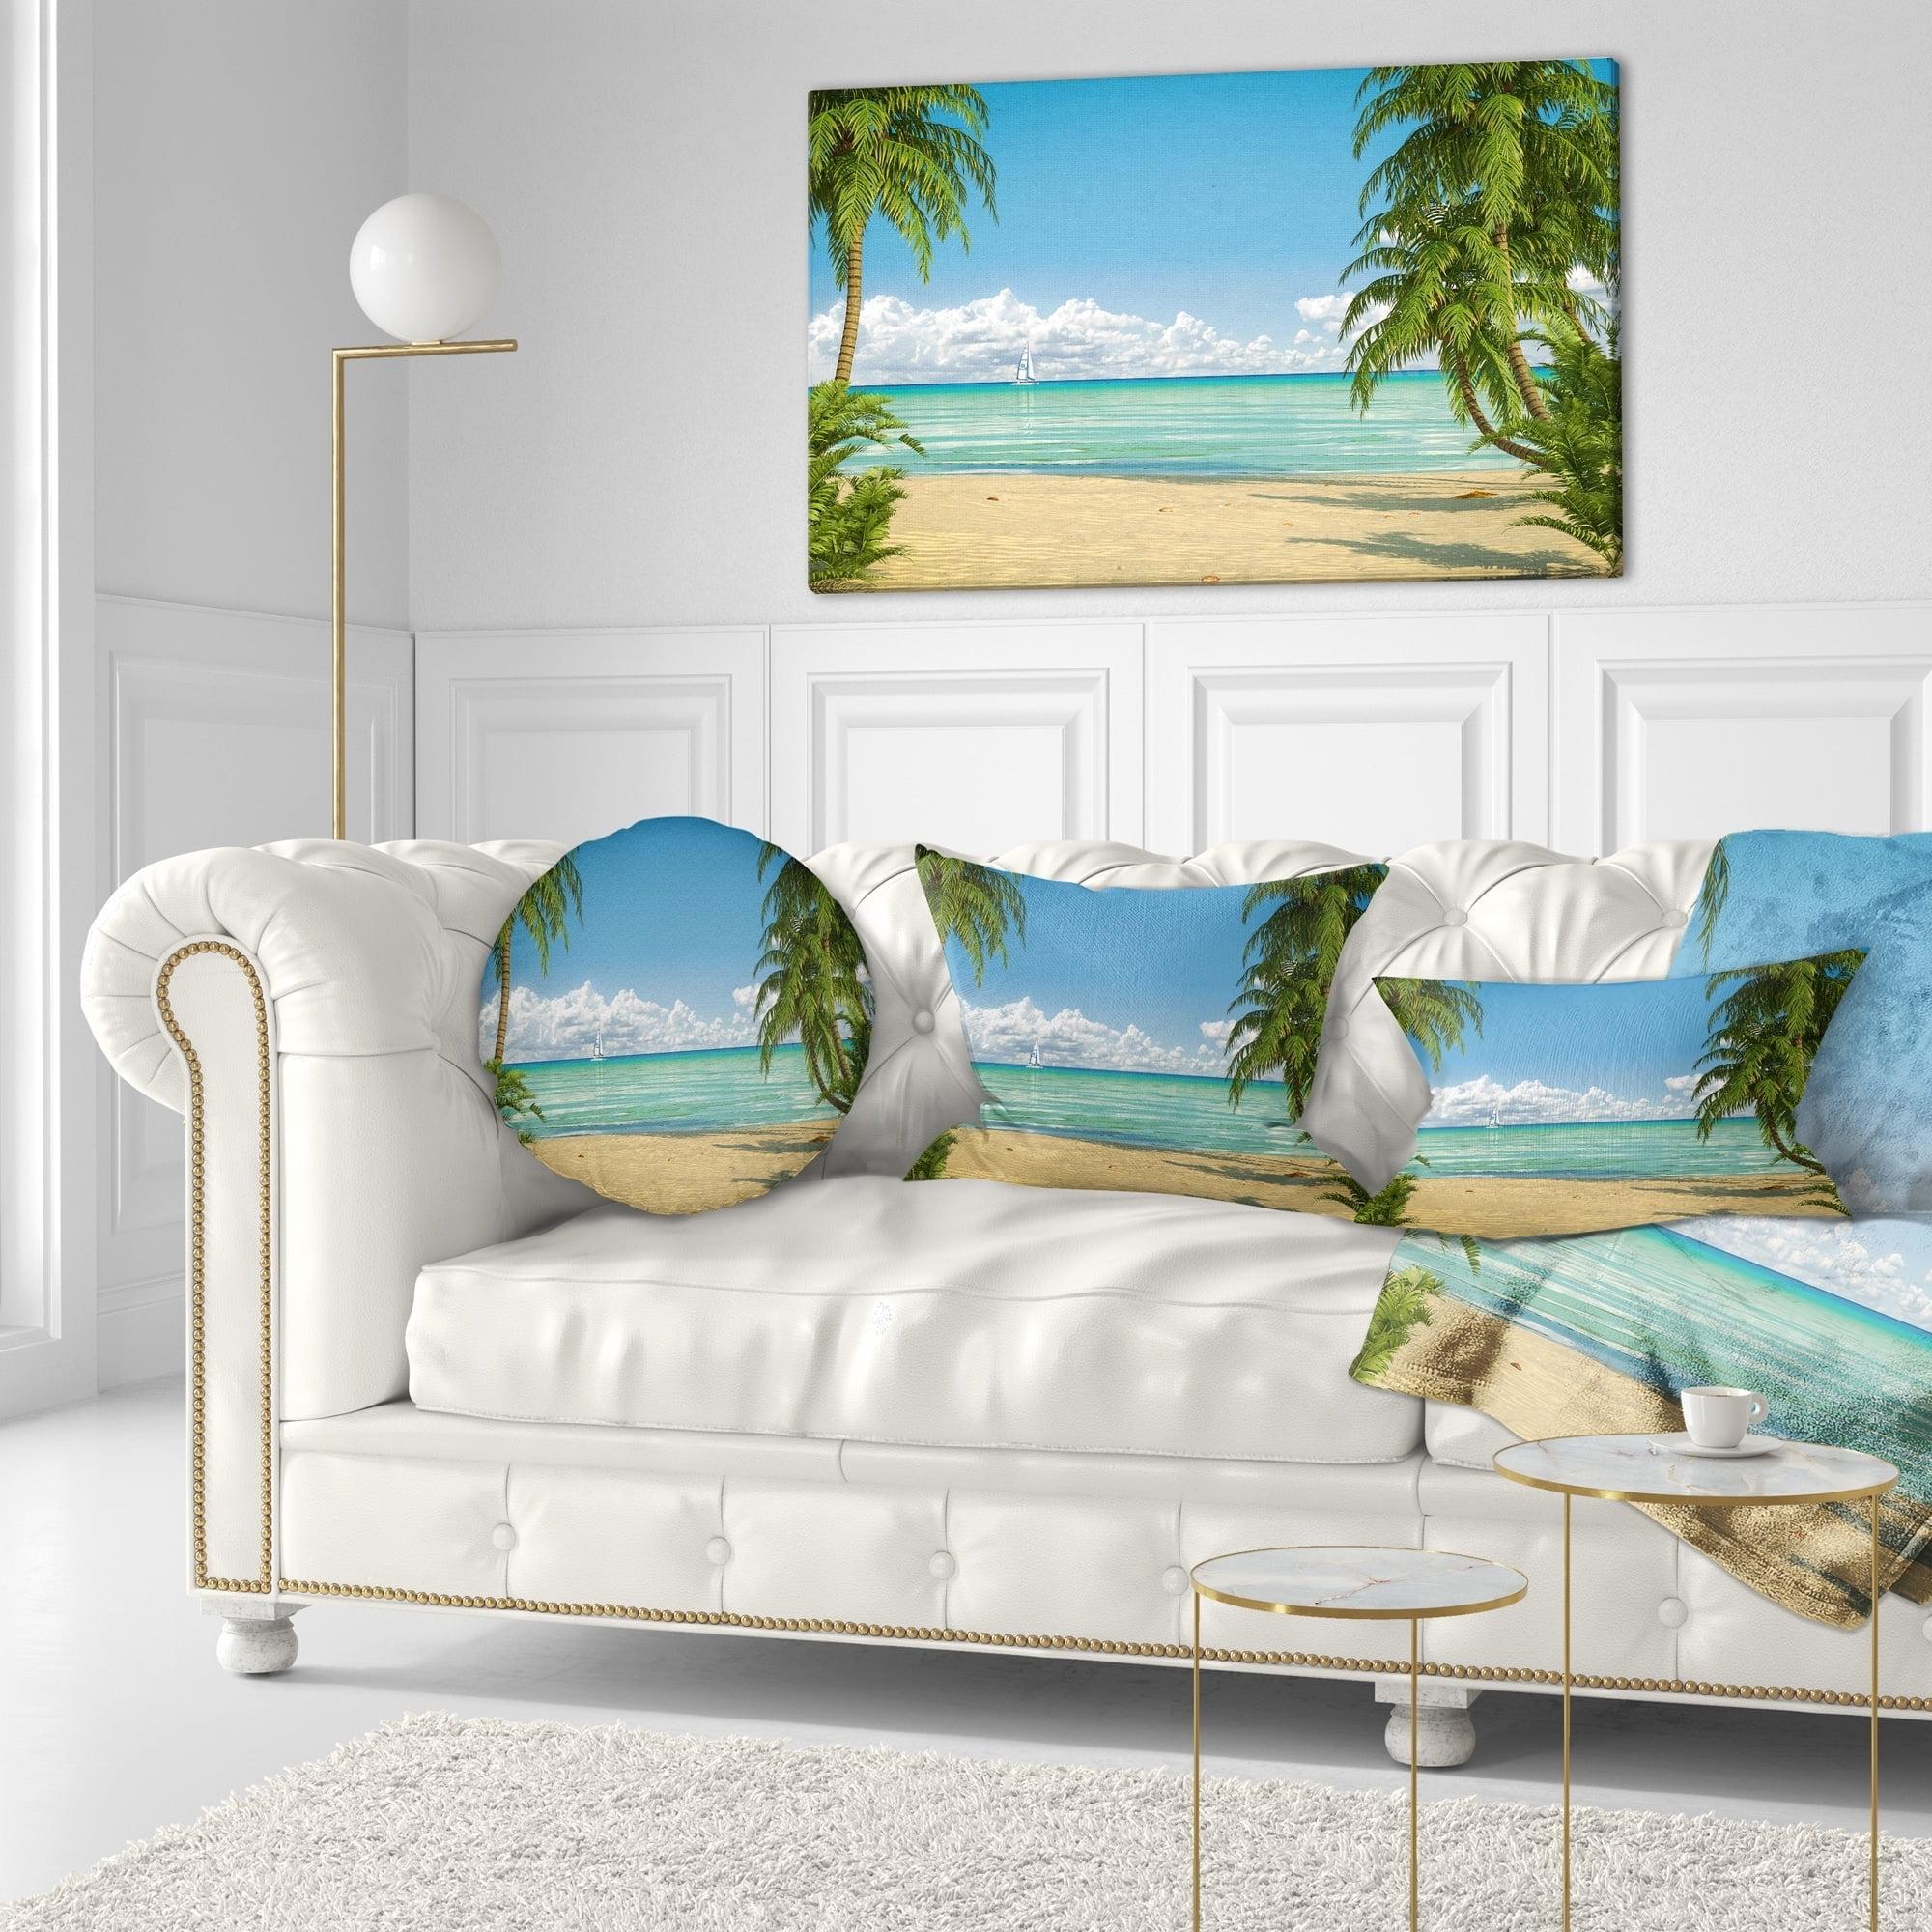 Sofa Throw Pillow 16 Insert Printed On Both Side Designart CU9447-16-16-C Palms at Caribbean Beach Seashore Photo Round Cushion Cover for Living Room